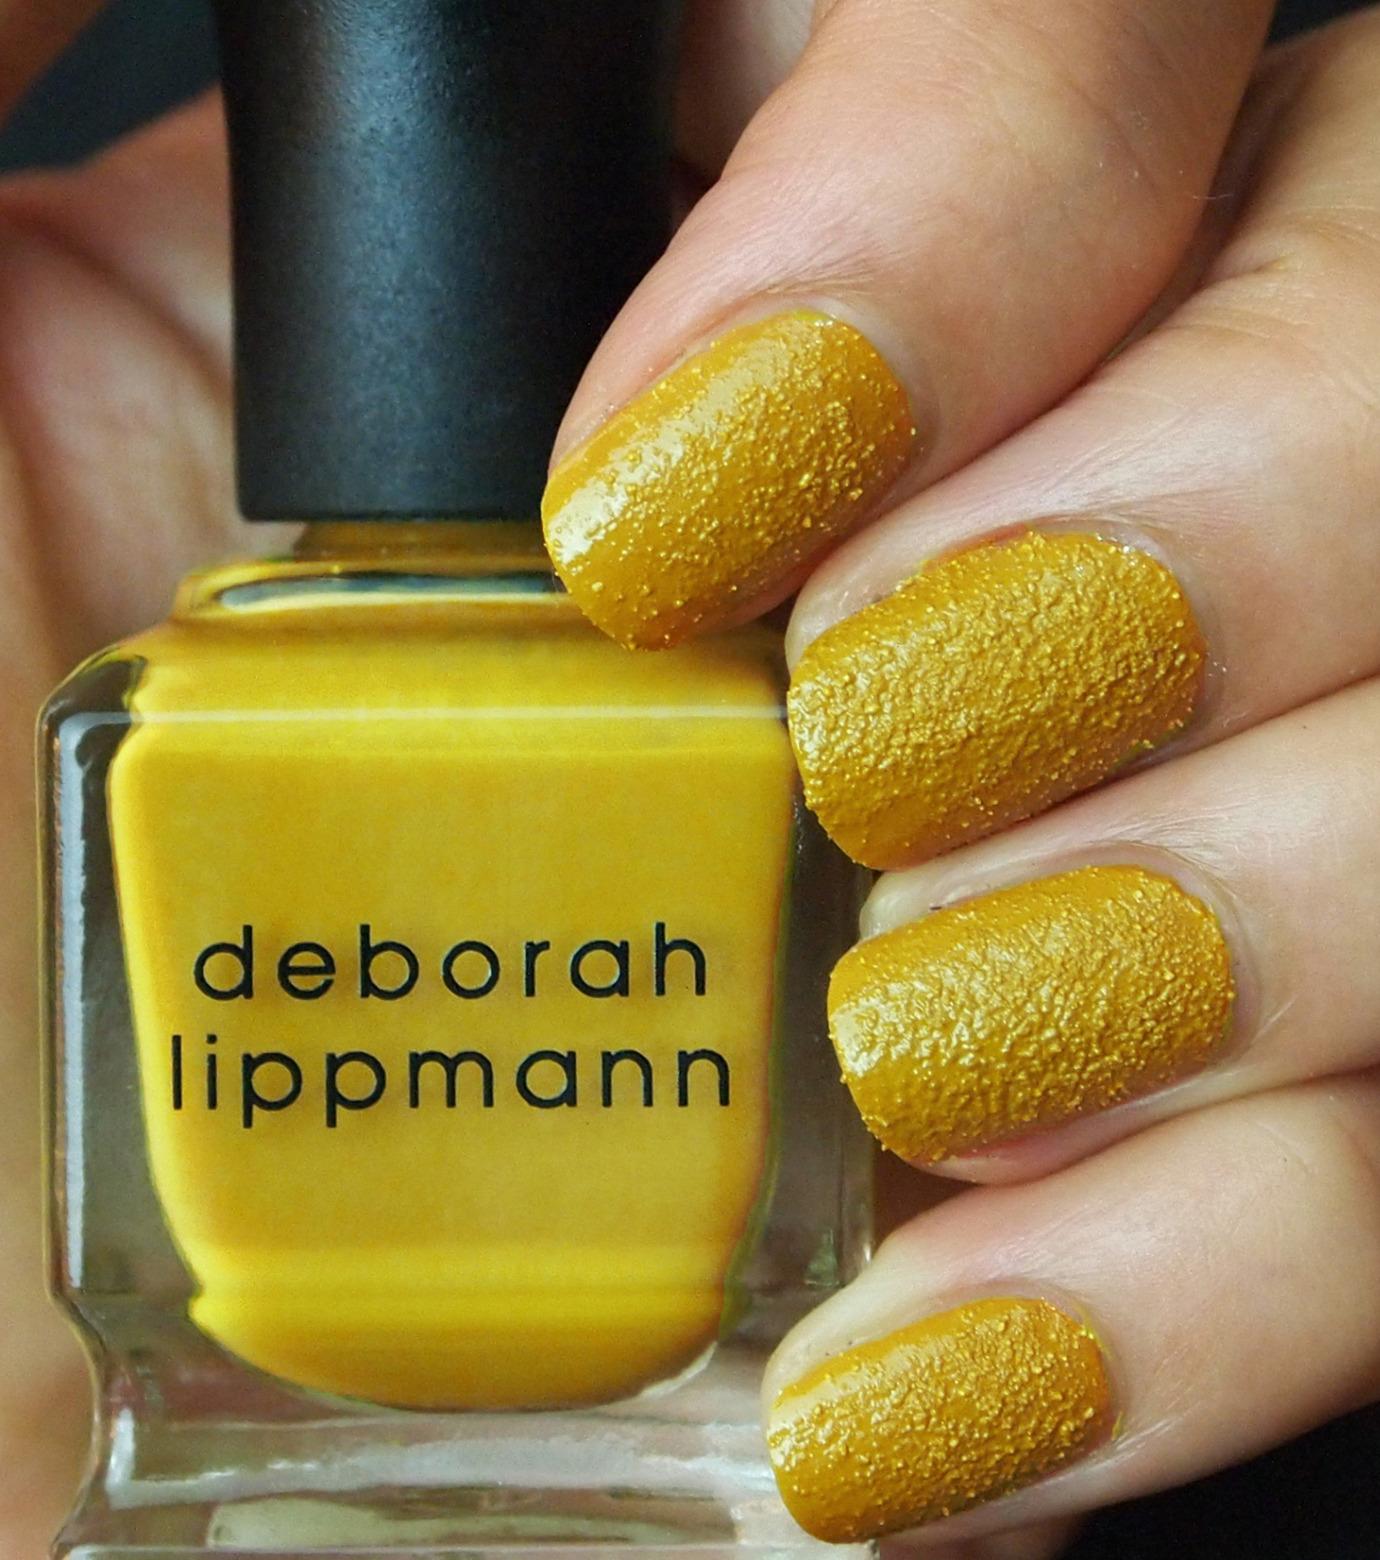 Deborah Lippmann(デボラリップマン)のI wanna be sedated-MUSTARD(MAKE-UP/MAKE-UP)-20224-33 拡大詳細画像2